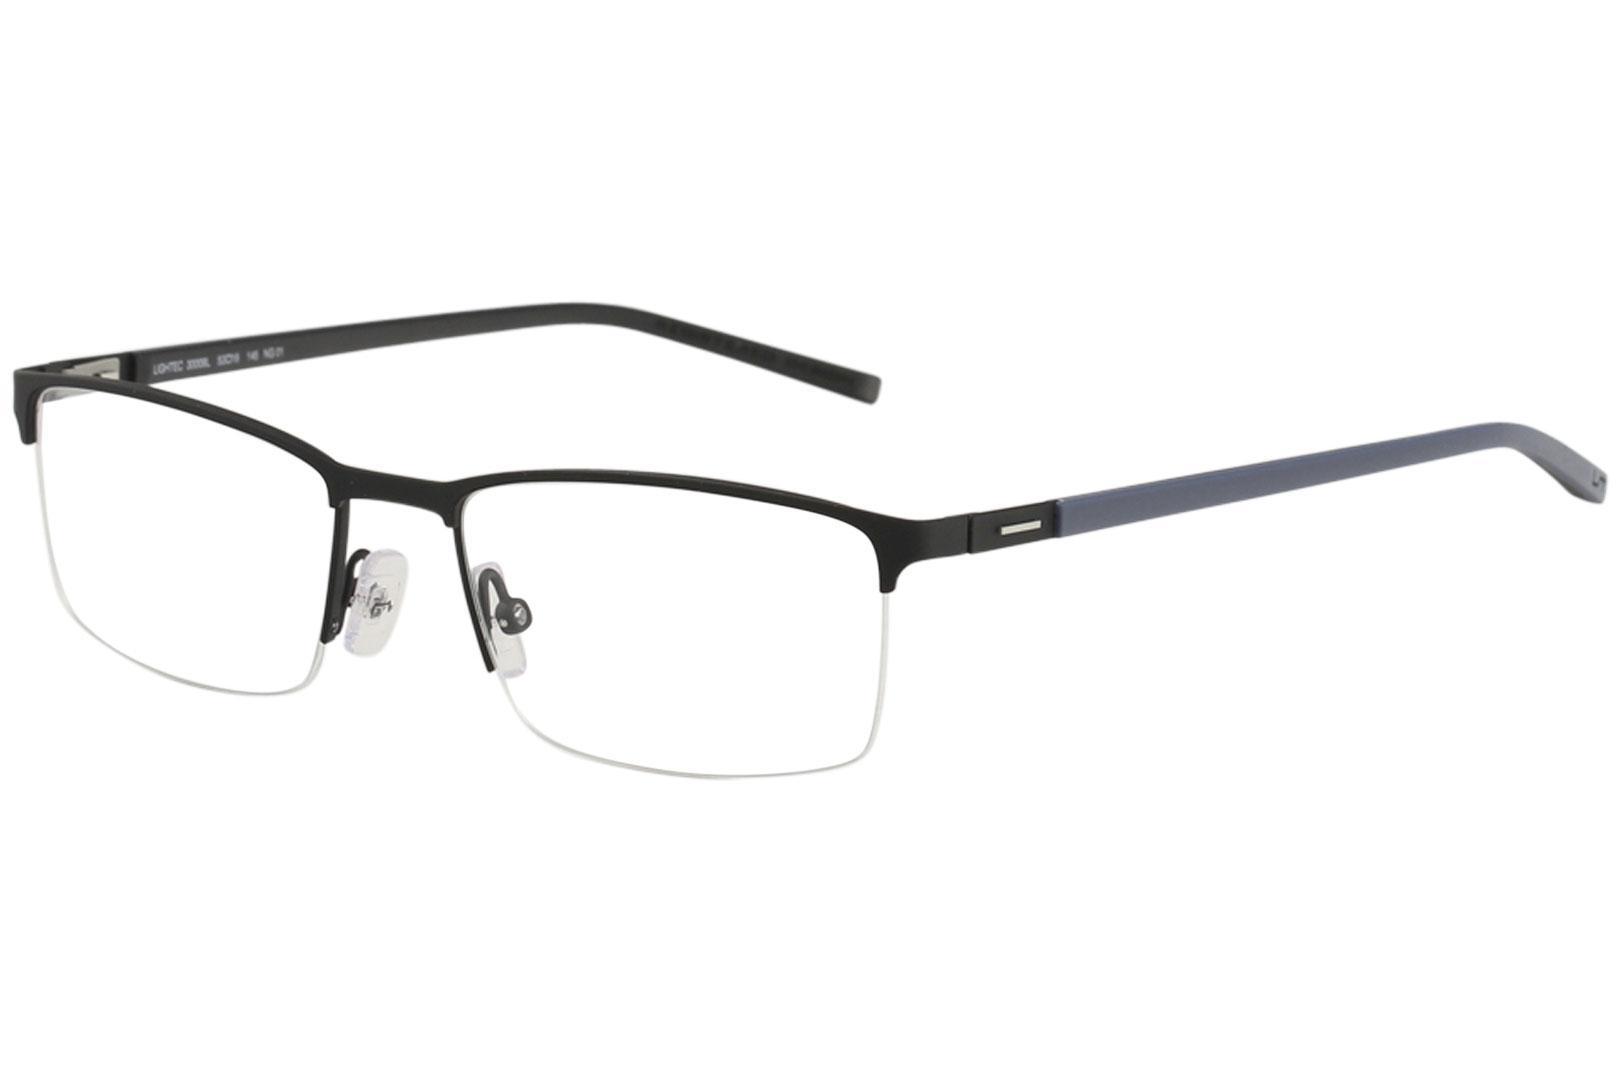 Image of Morel Men's Eyeglasses Lightec 30009L 30009/L Half Rim Optical Frame - Black - Lens 53 Bridge 18 Temple 145mm